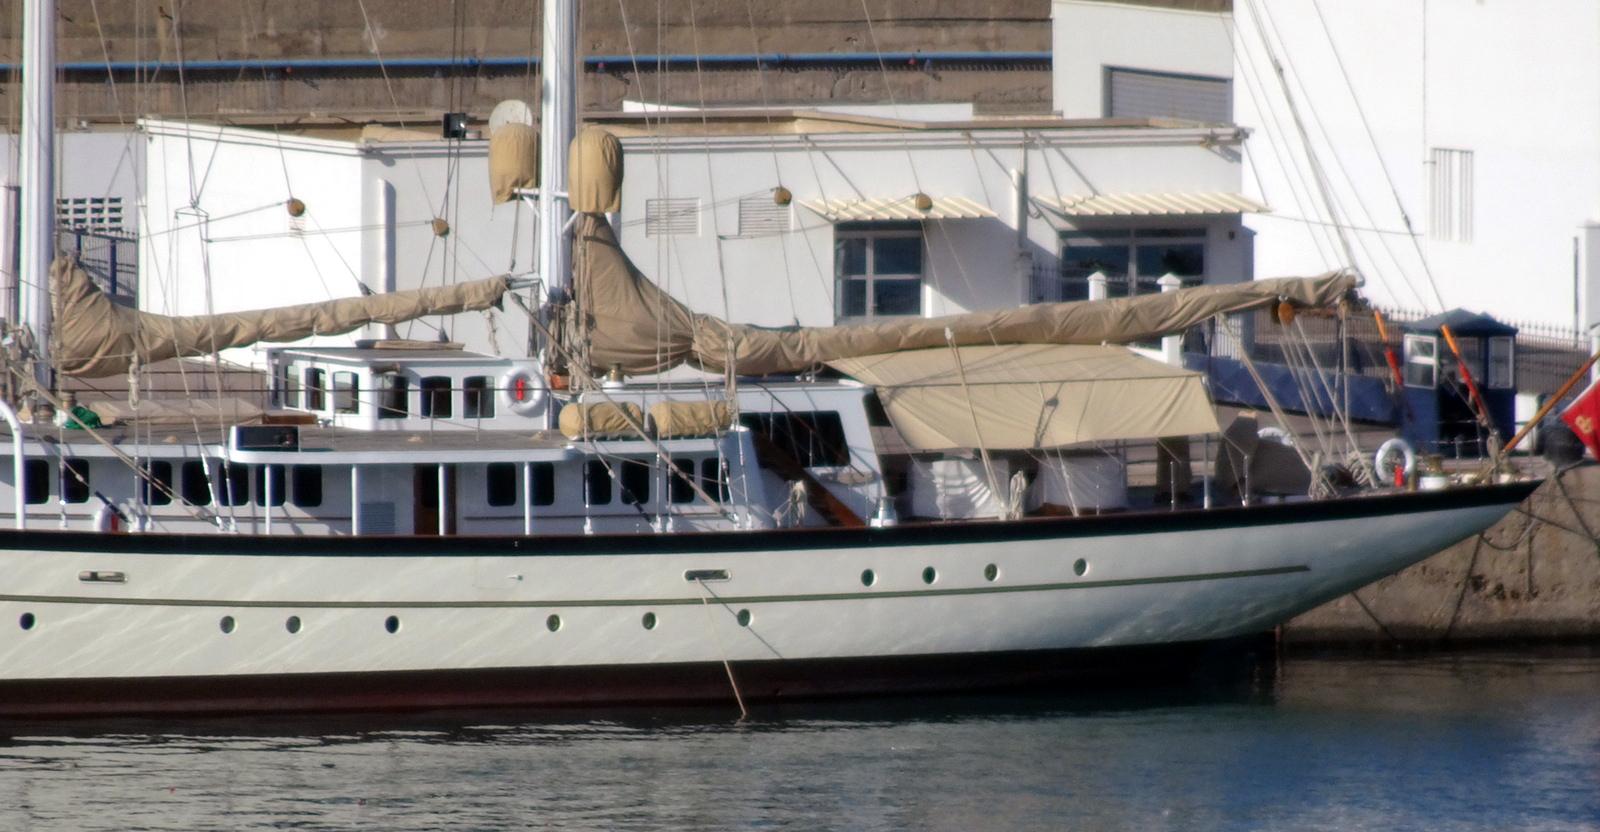 la flotte des Yachts Royals : El Boughaz I - Badis 1 - Page 2 160131063534969599